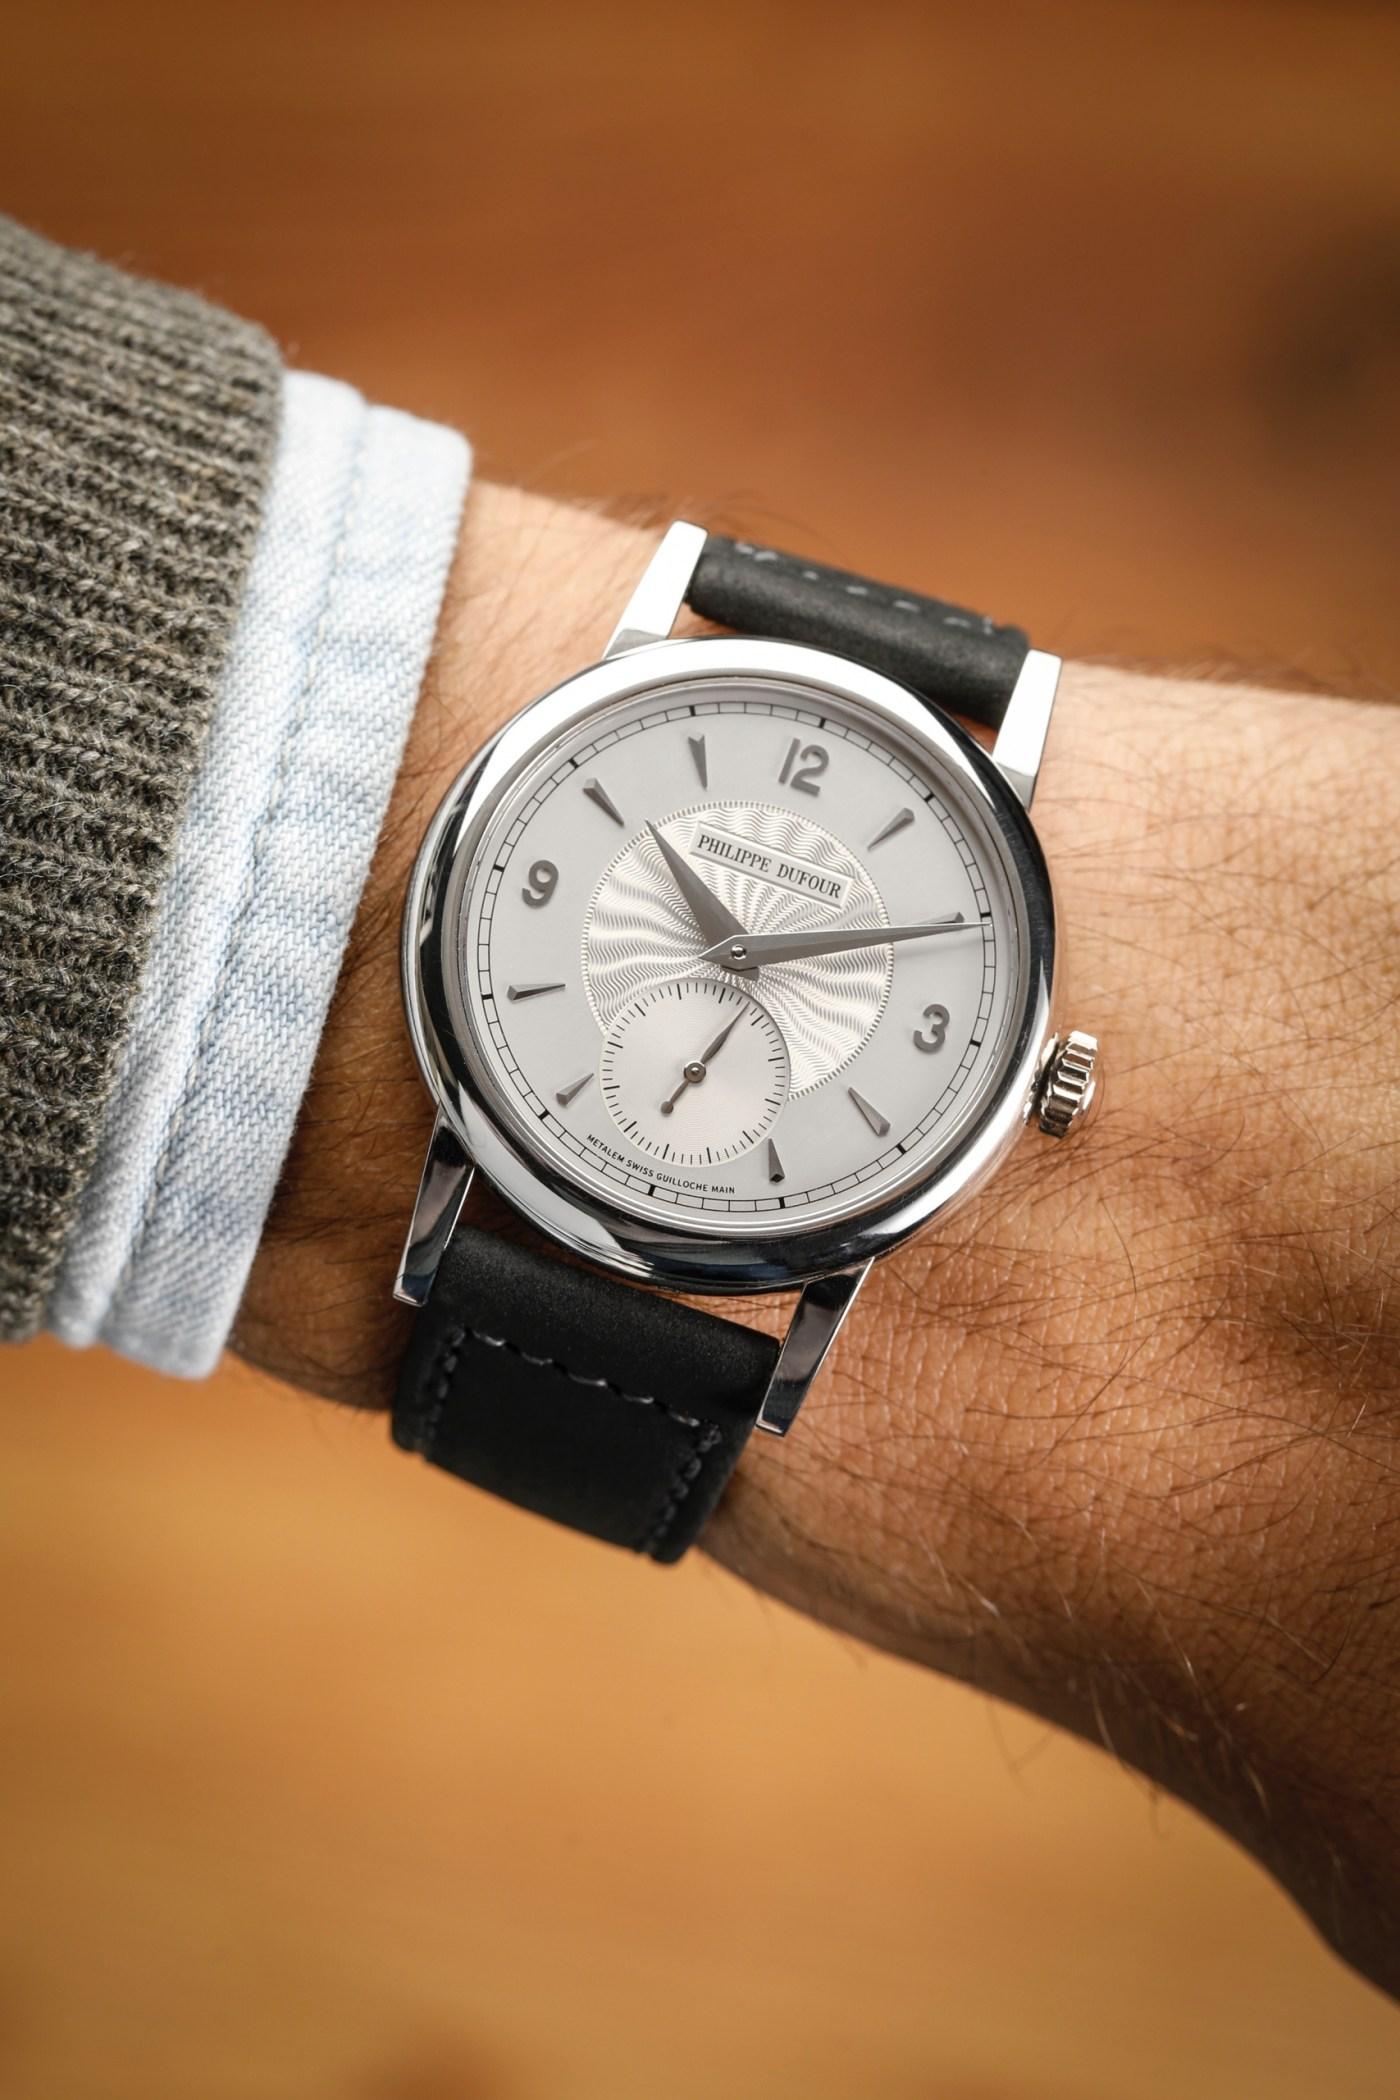 Philippe Dufour Simplicity wristshot